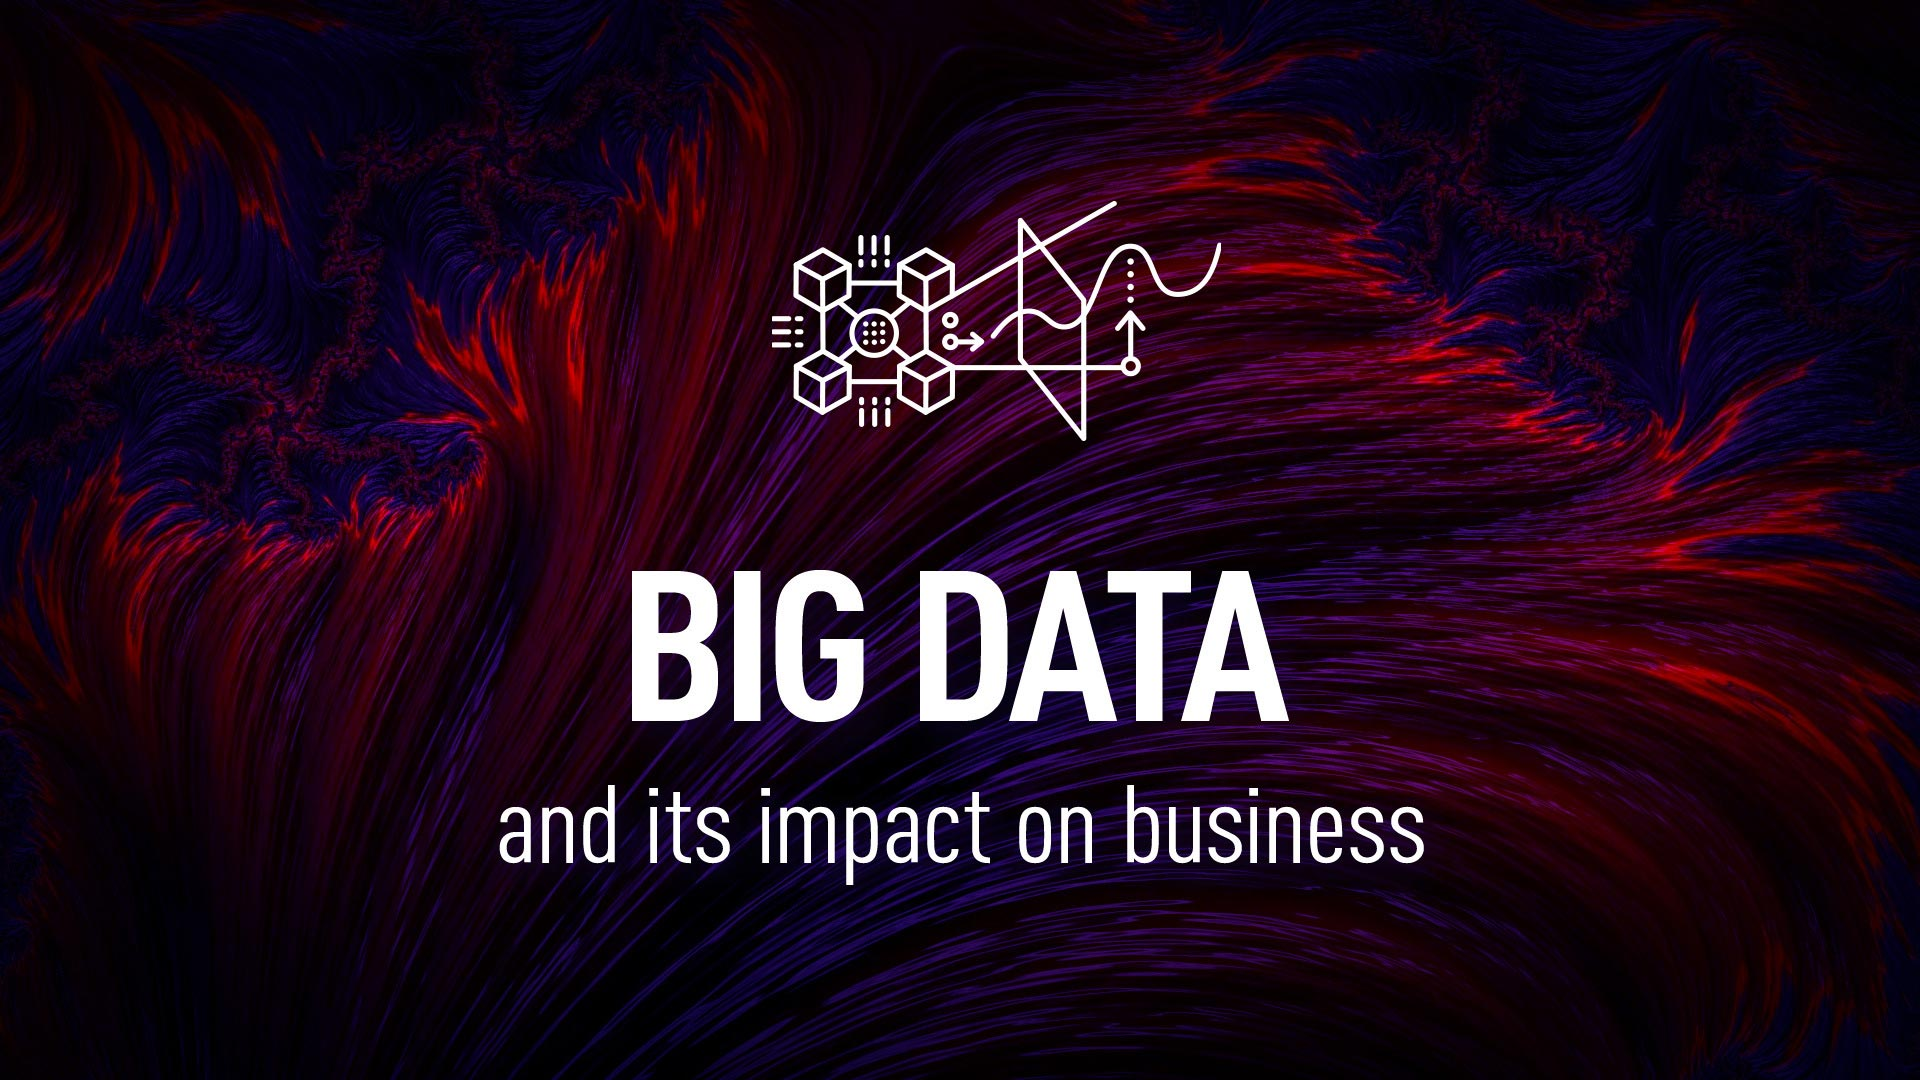 Big Data impact on business